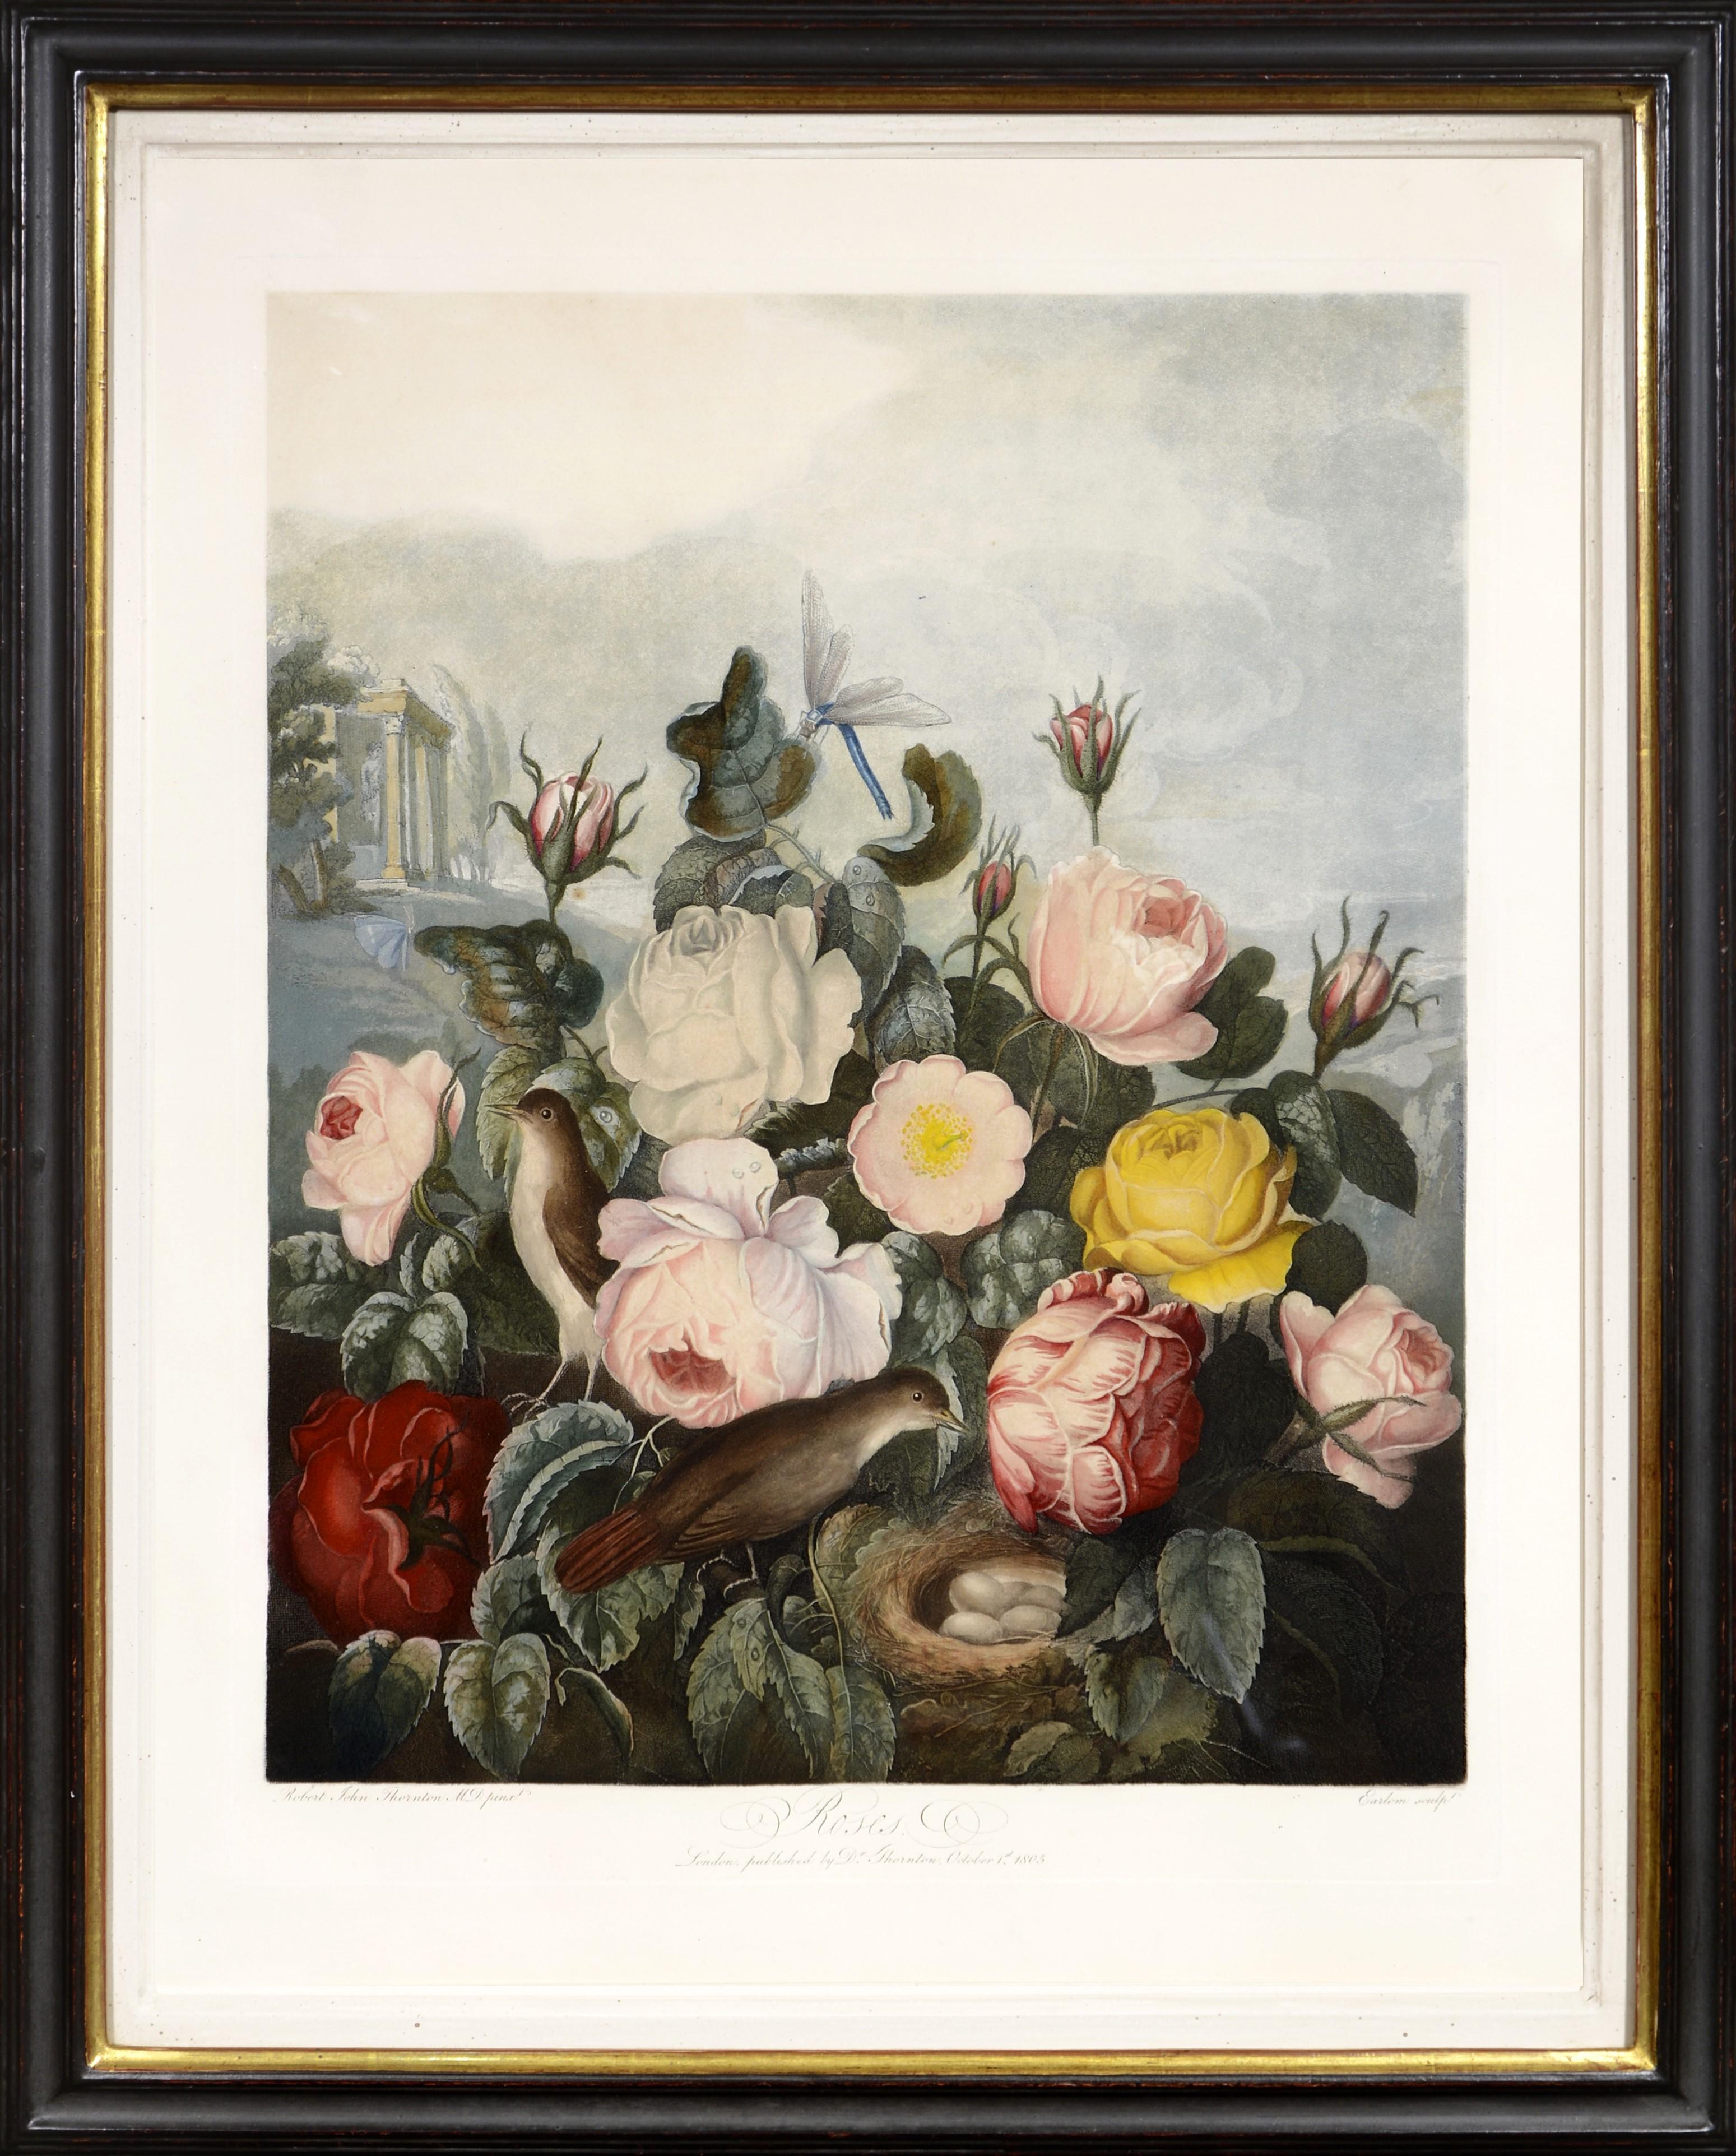 THORNTON. The Roses